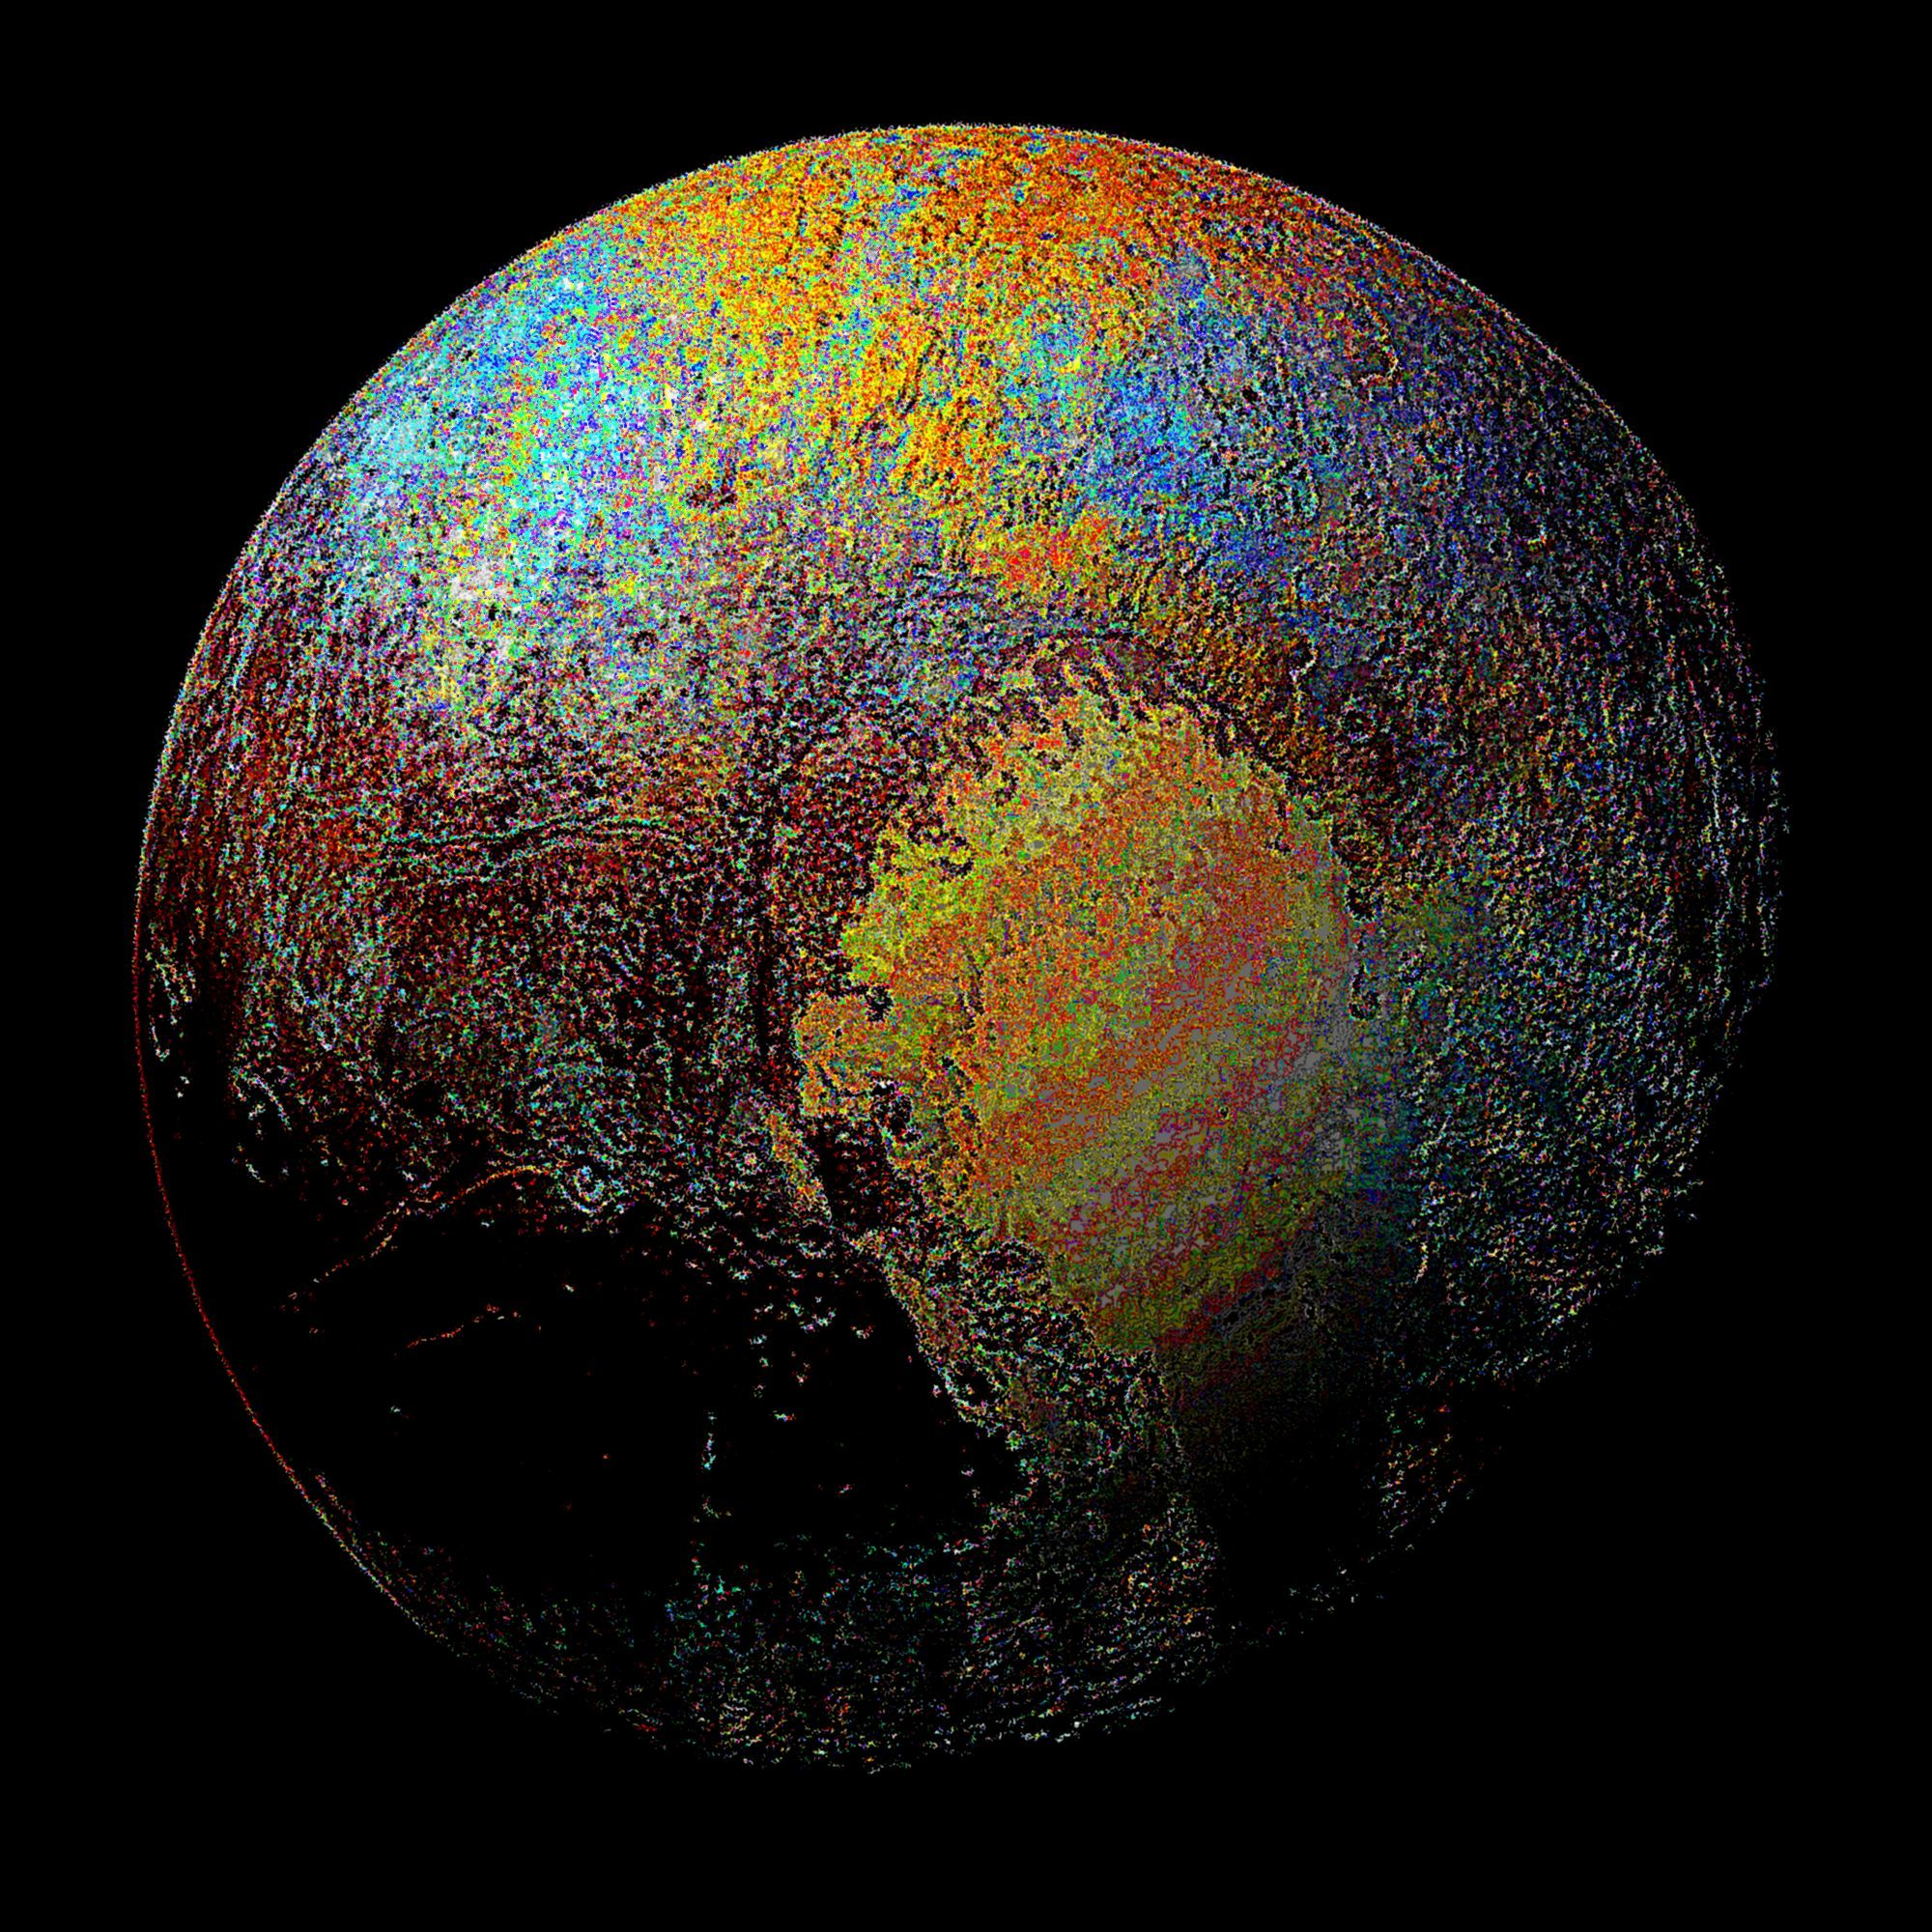 [Pilt: Pluto_Stern_25_W_02.jpg]